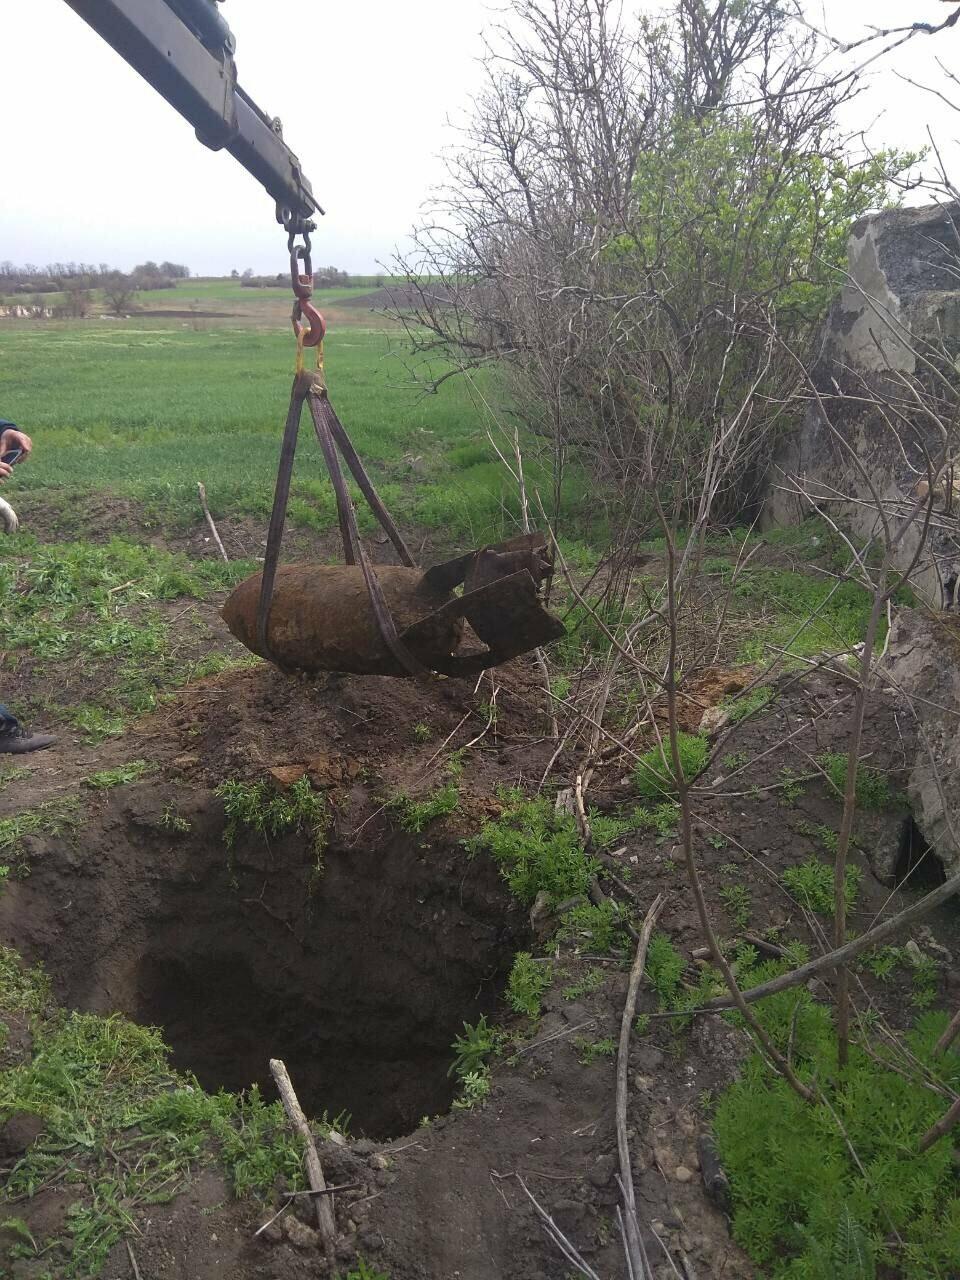 На Днепропетровщине взорвали фугасную авиационную бомбу (ФОТО, ВИДЕО), фото-1